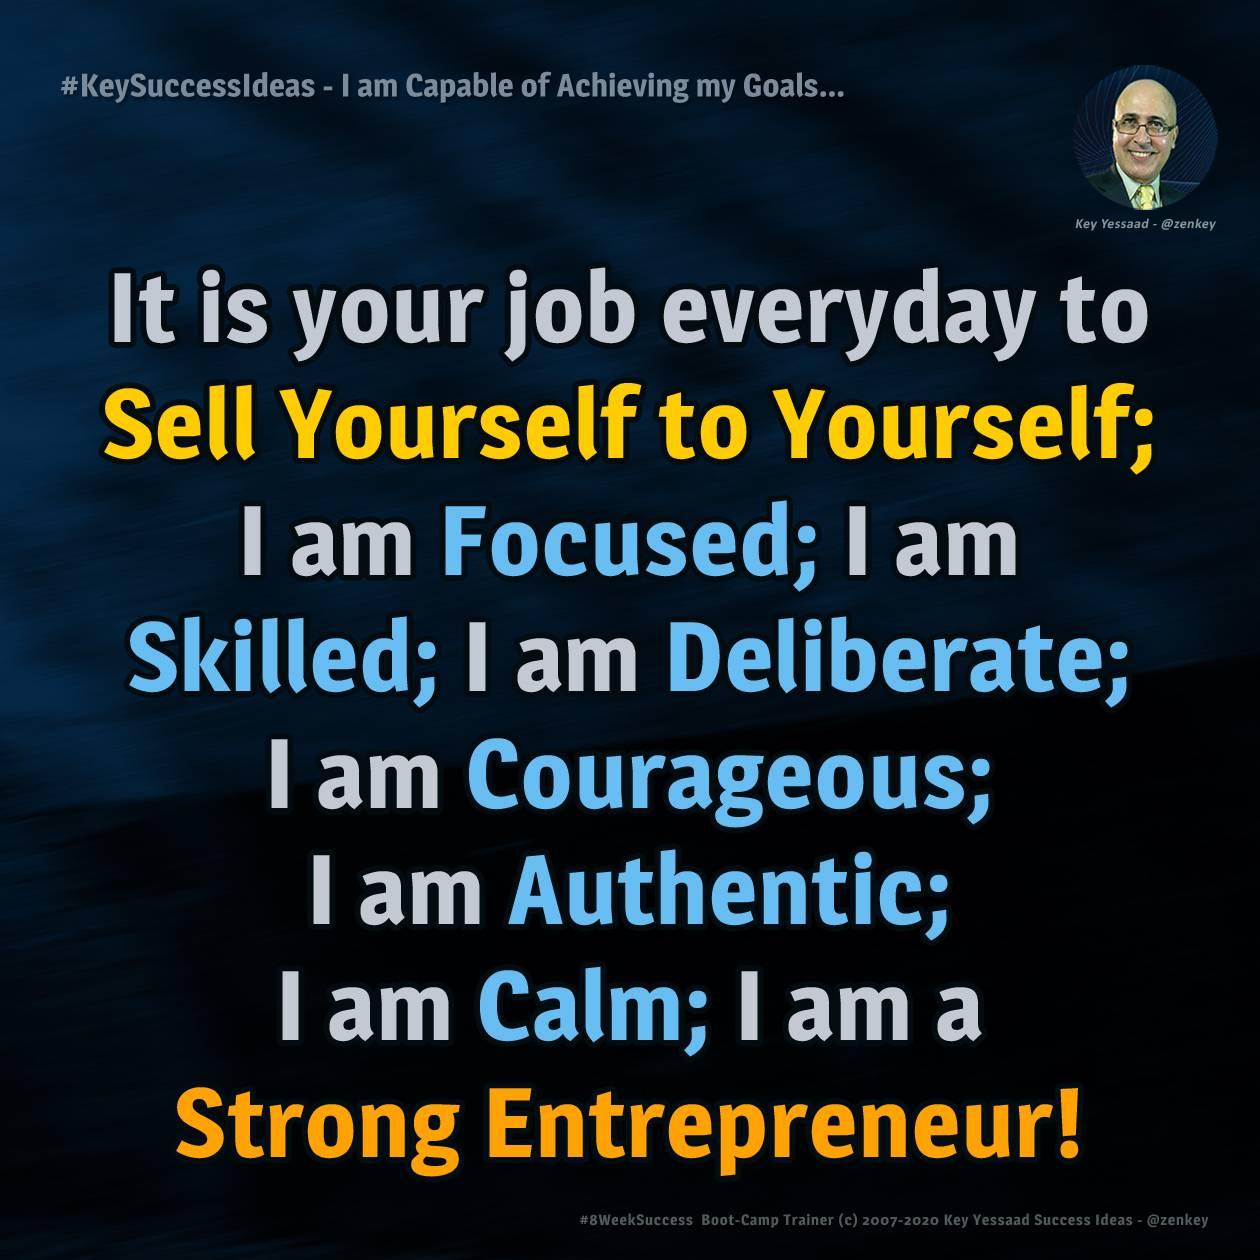 I am Capable of Achieving my Goals... - #KeySuccessIdeas